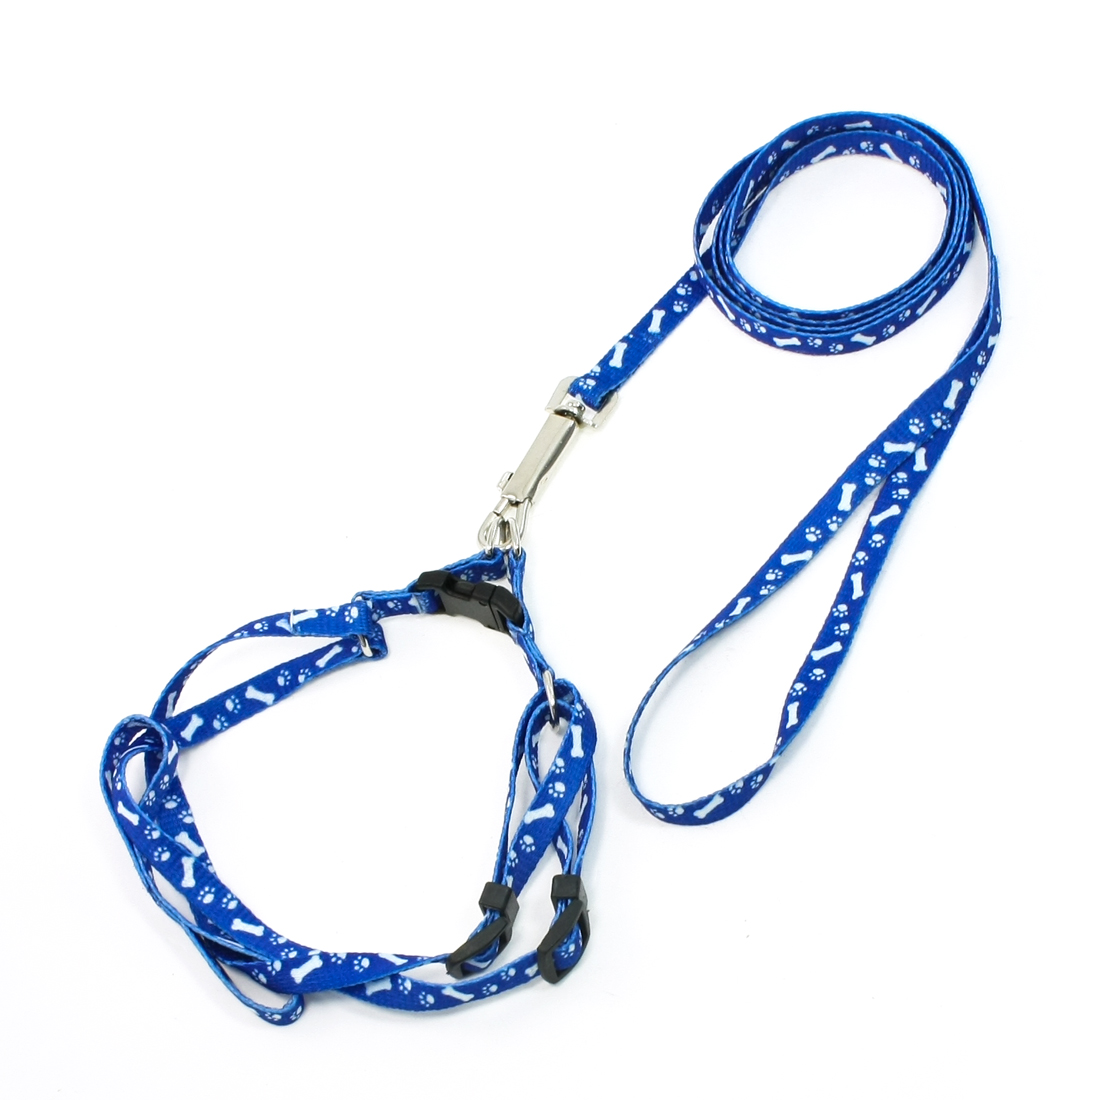 1.18M Lead Bone Print Doggie Dog Collar Halter Harness Leash Blue White